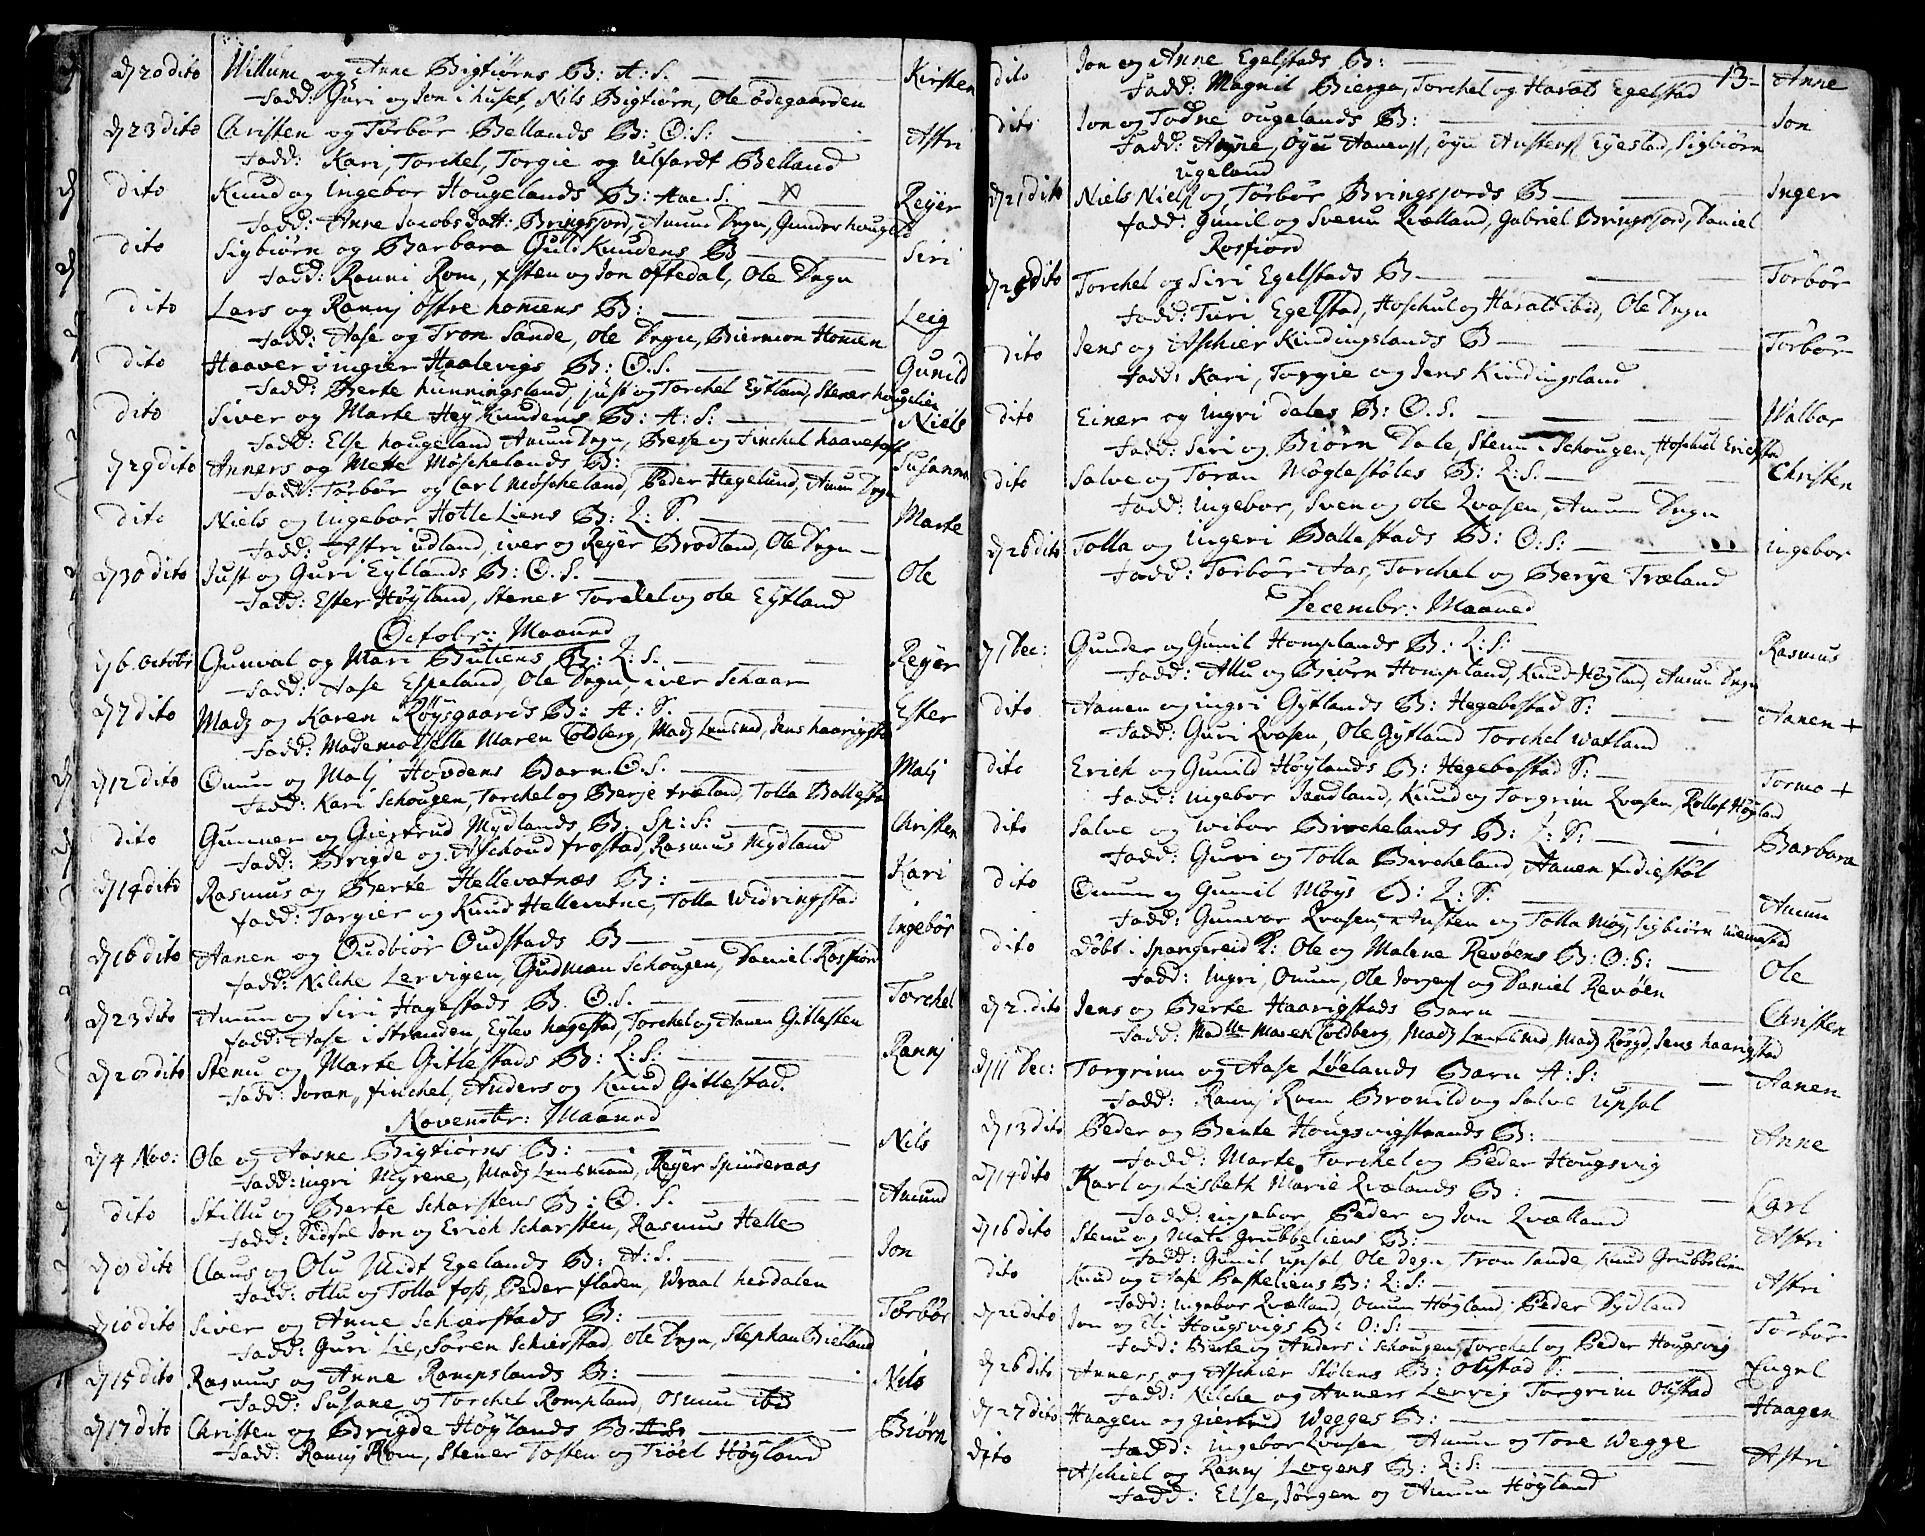 SAK, Lyngdal sokneprestkontor, F/Fa/Fac/L0001: Ministerialbok nr. A 1, 1727-1779, s. 13